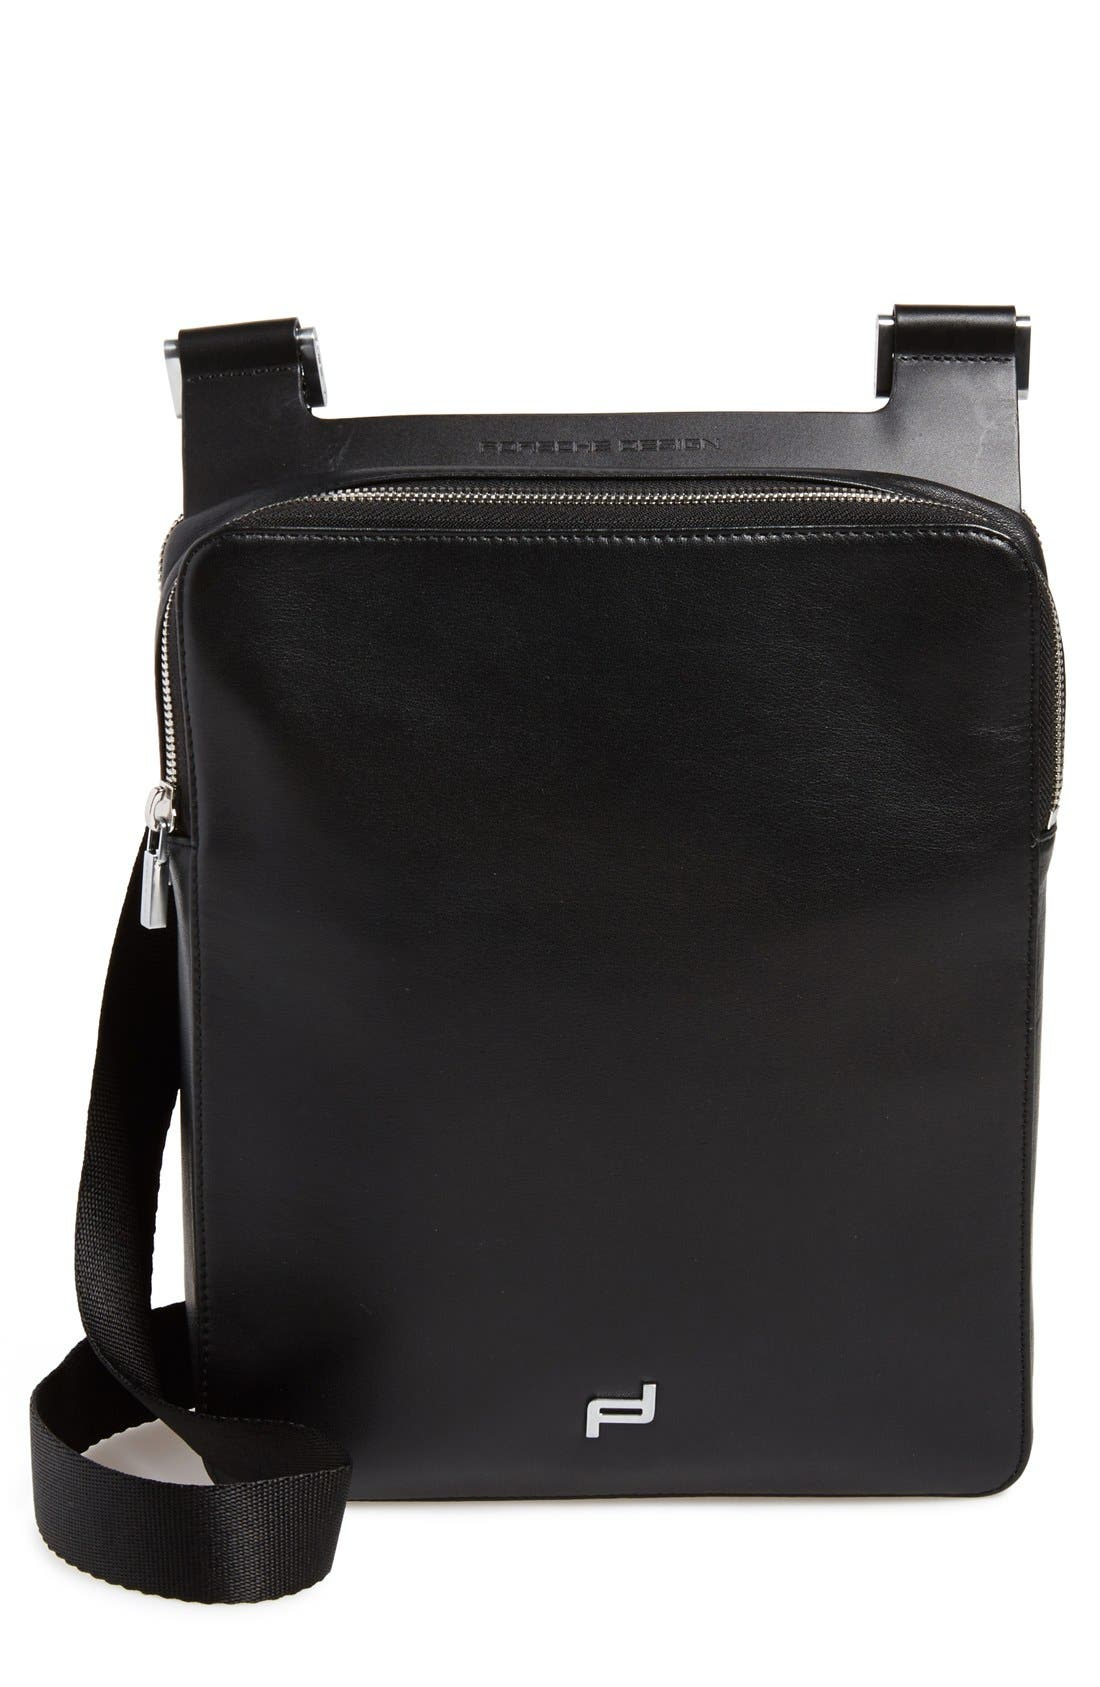 Porsche Design 'Shyrt' City Bag